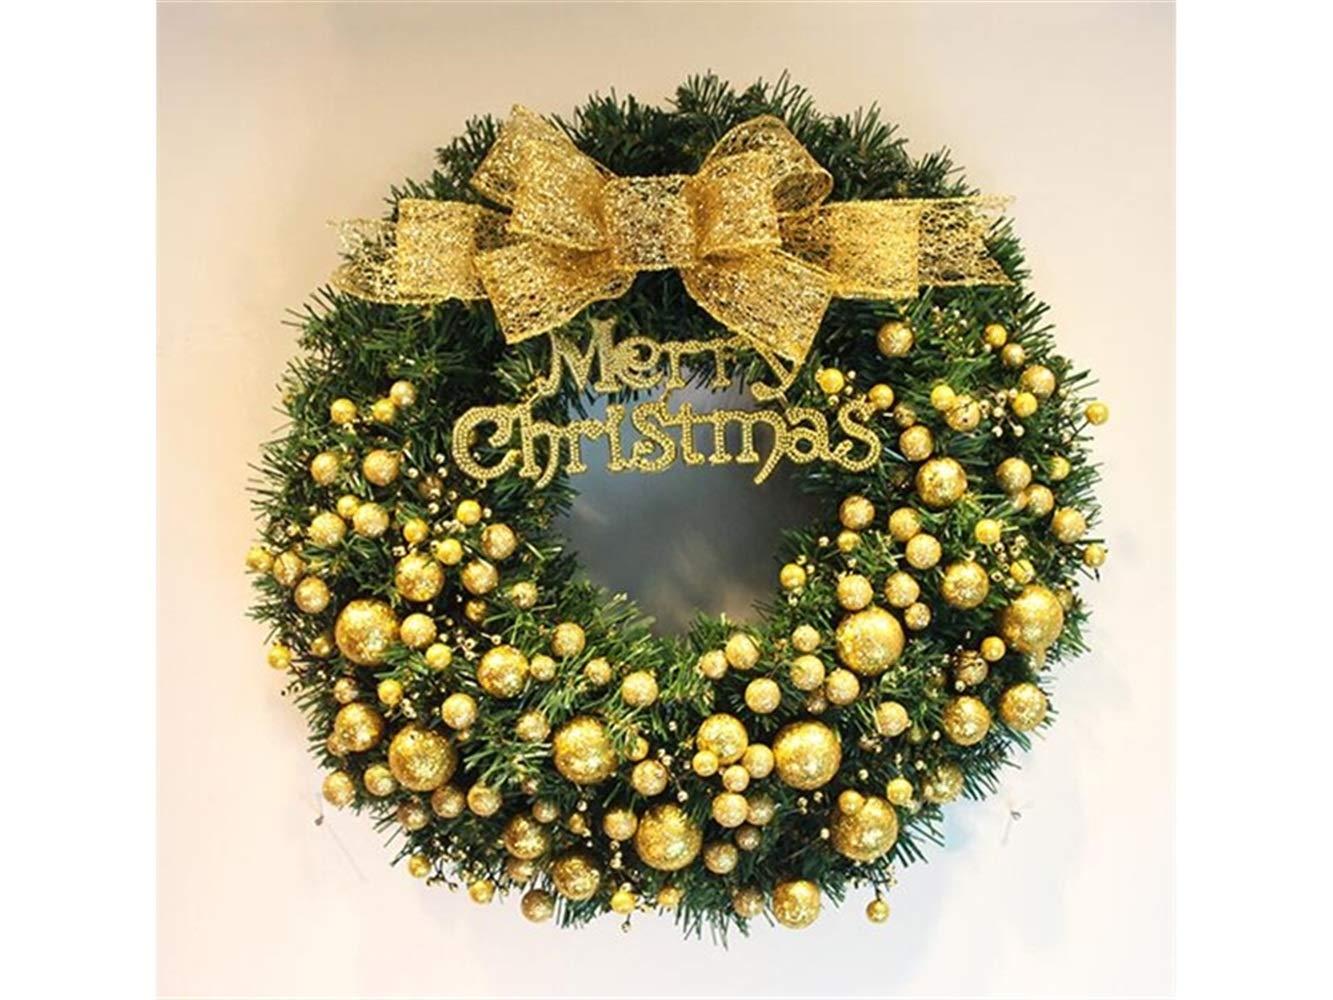 Gelaiken World Christmas Golden Ball Christmas Garland Door Hanging Ornaments Room Christmas Tree Pendants for Decoration